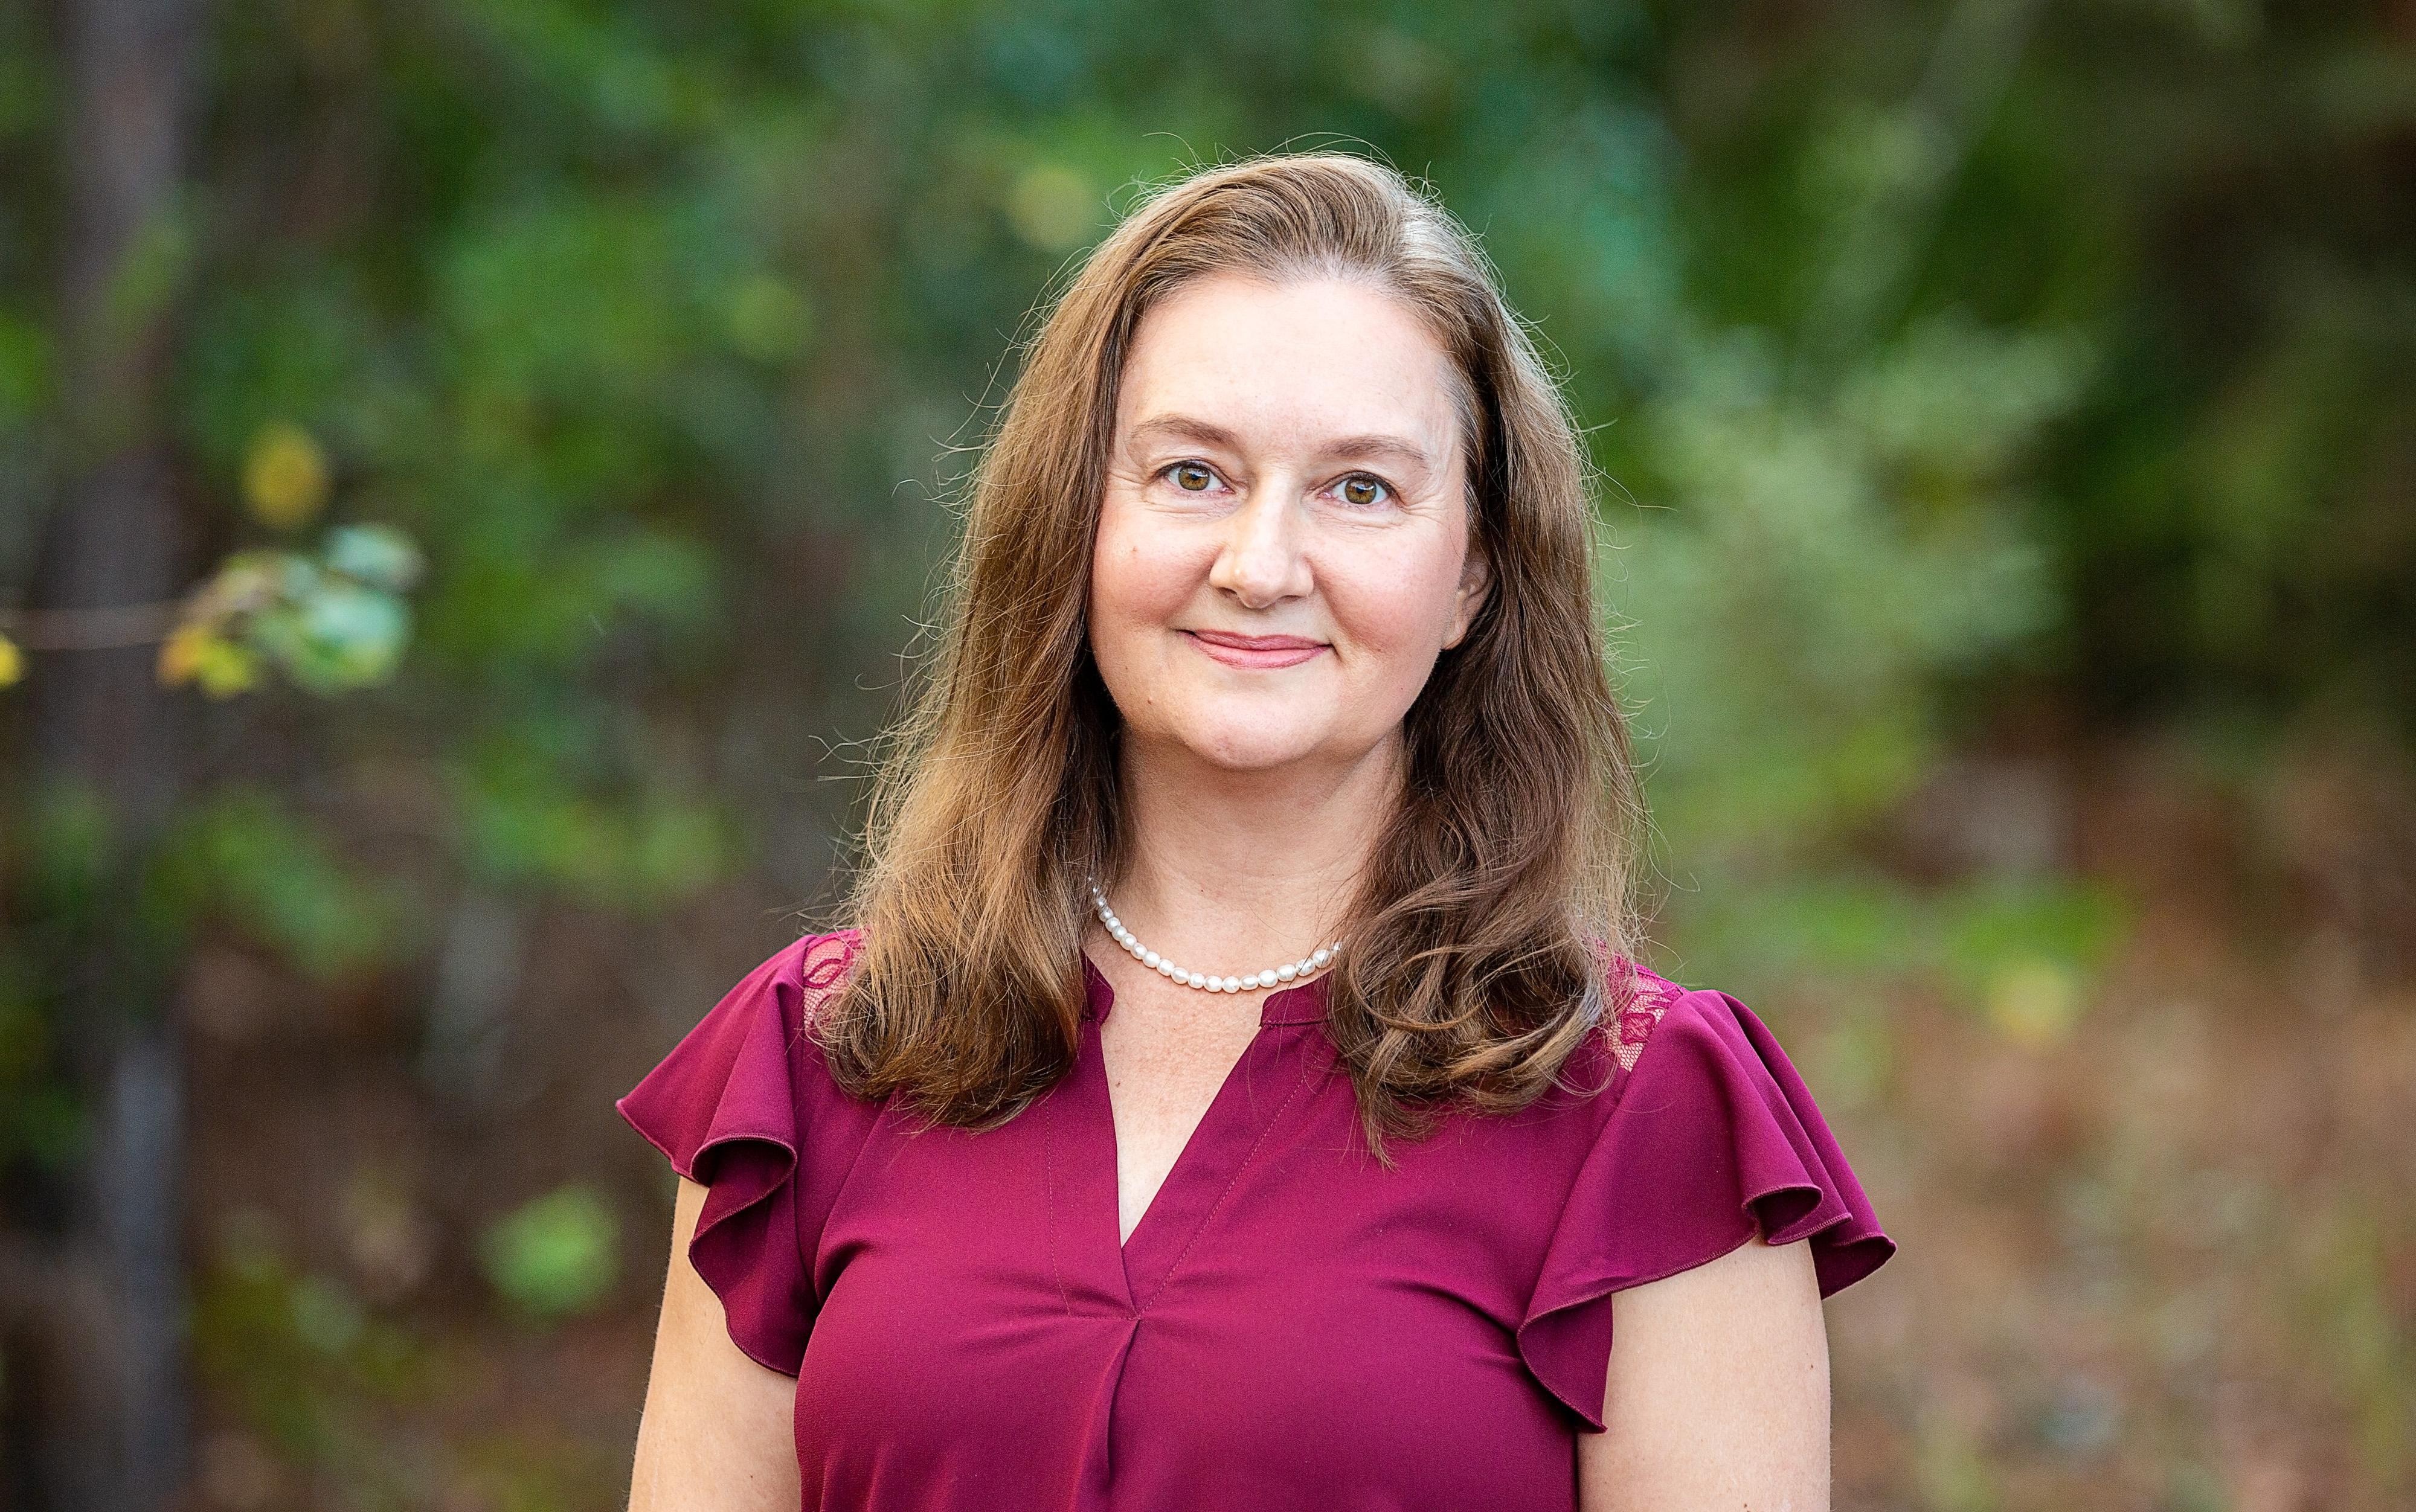 Dr. Christi Seaward